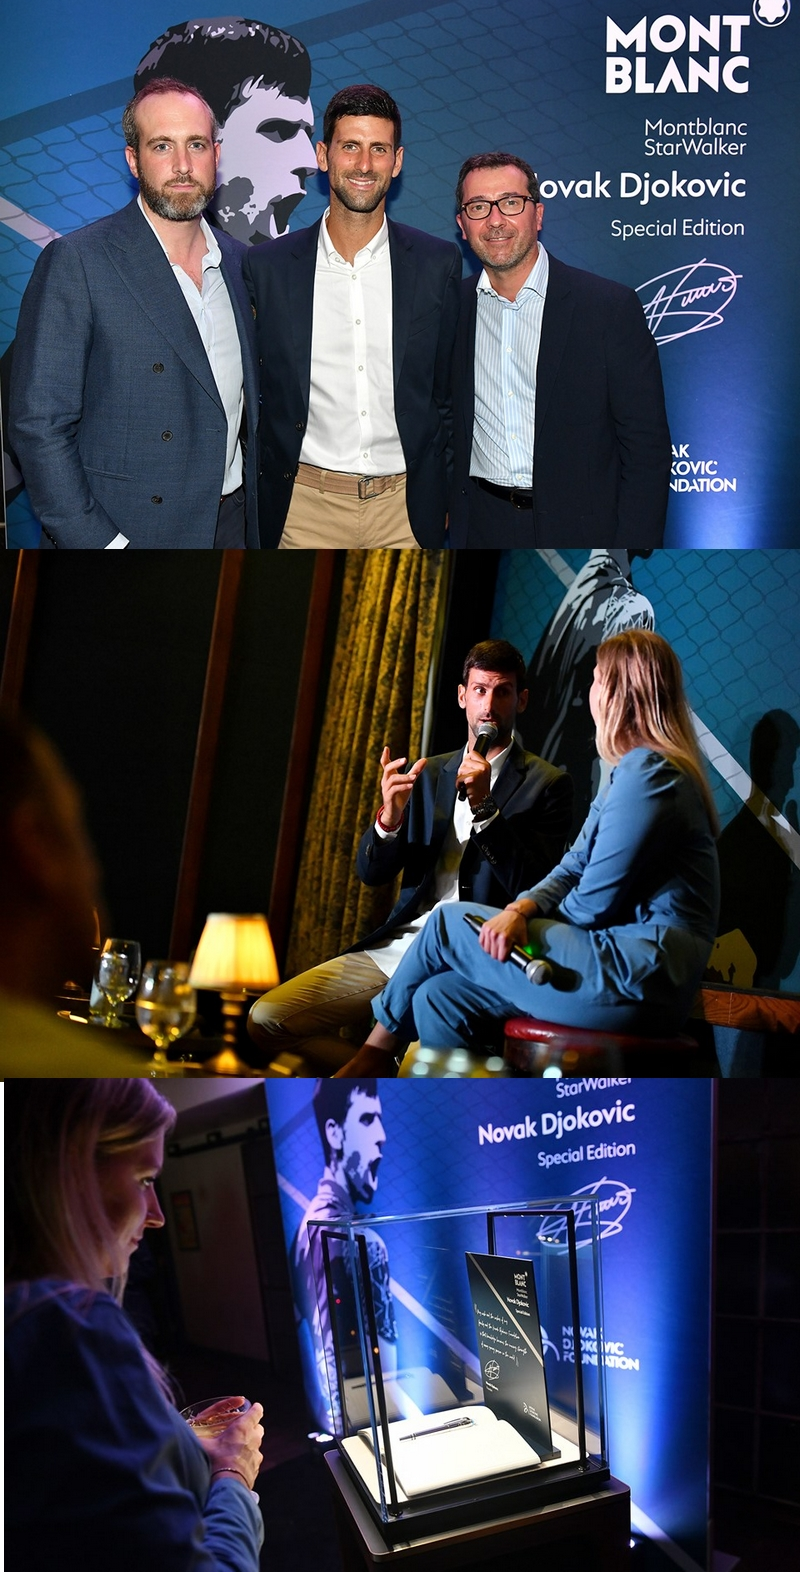 partnership between Montblanc and Novac Djokovic Foundation 2019-03